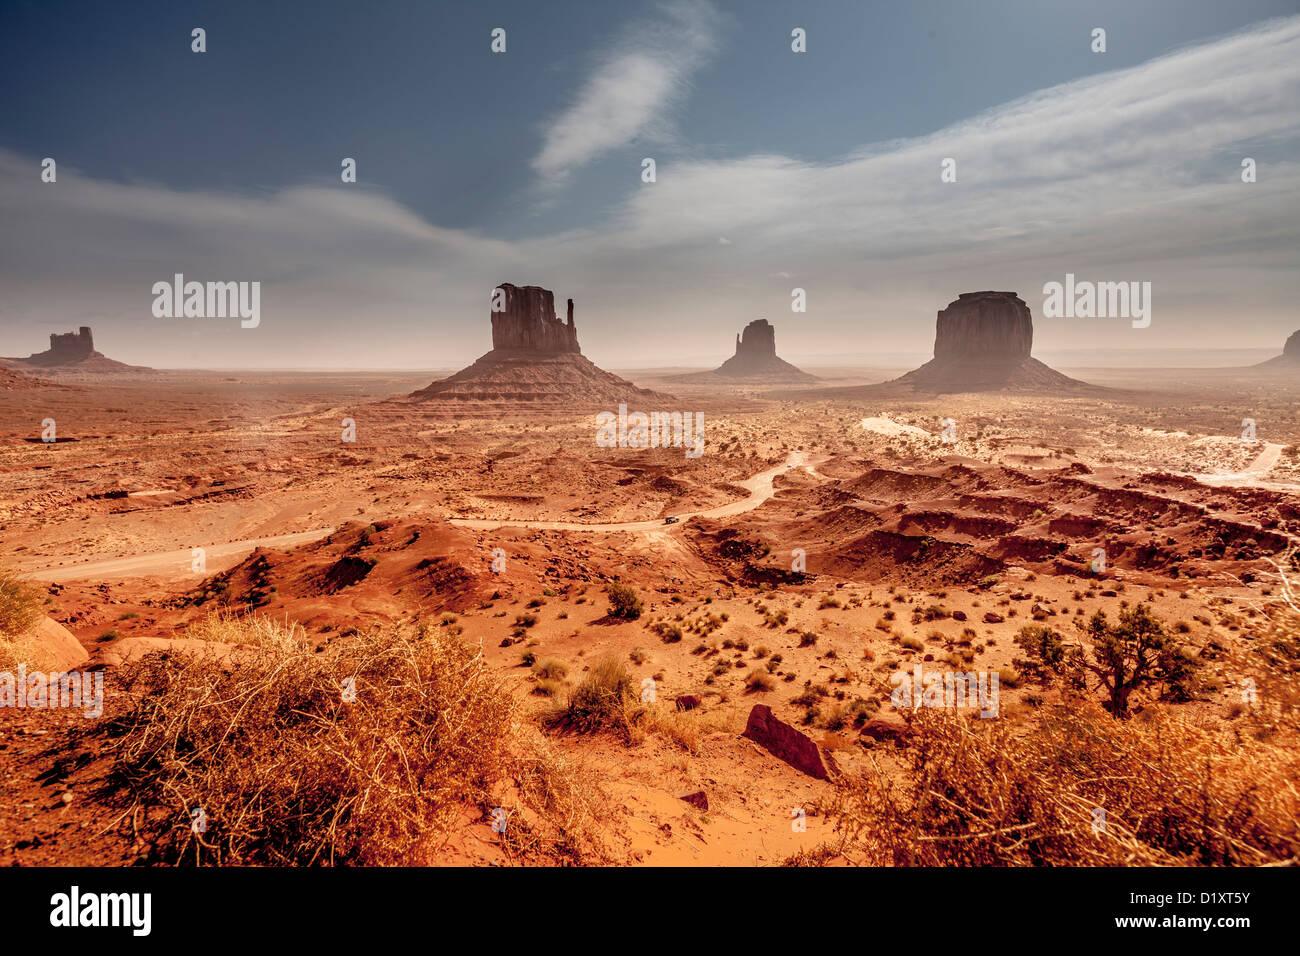 En el Monument Valley Navajo Tribal Park Imagen De Stock